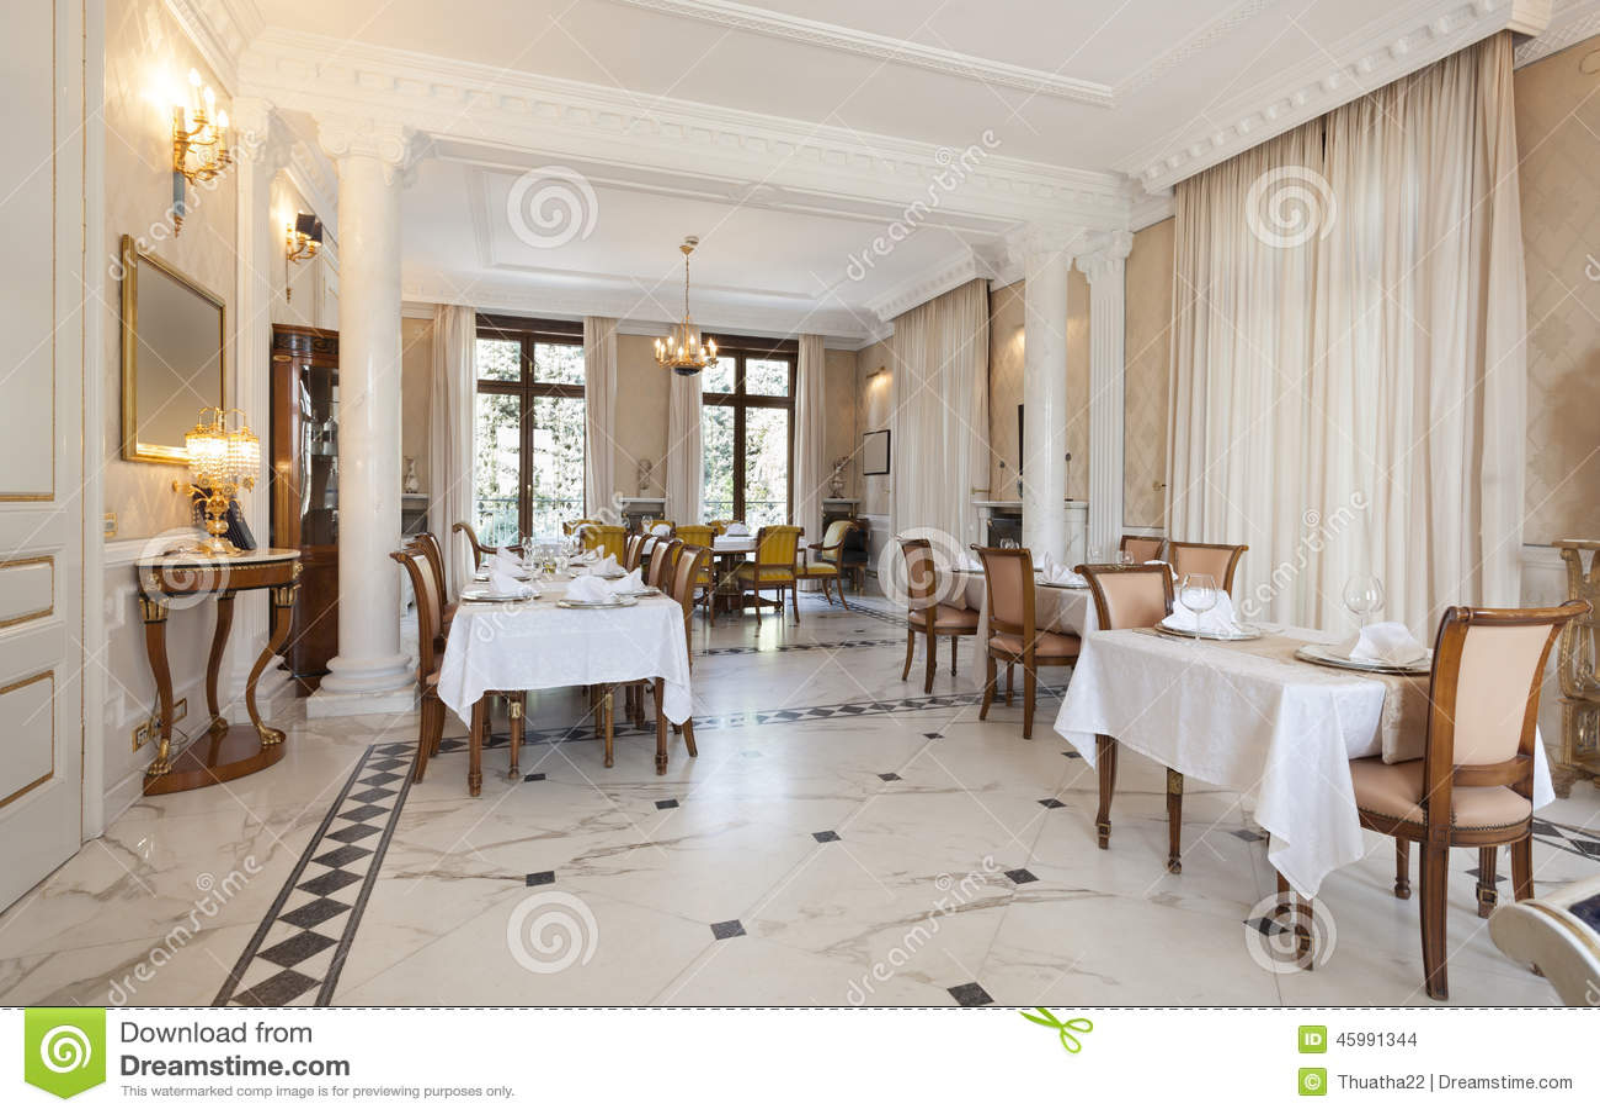 interieur villa de luxe decoration interieur villa luxe casa cook hotel with ethnic chic decor. Black Bedroom Furniture Sets. Home Design Ideas